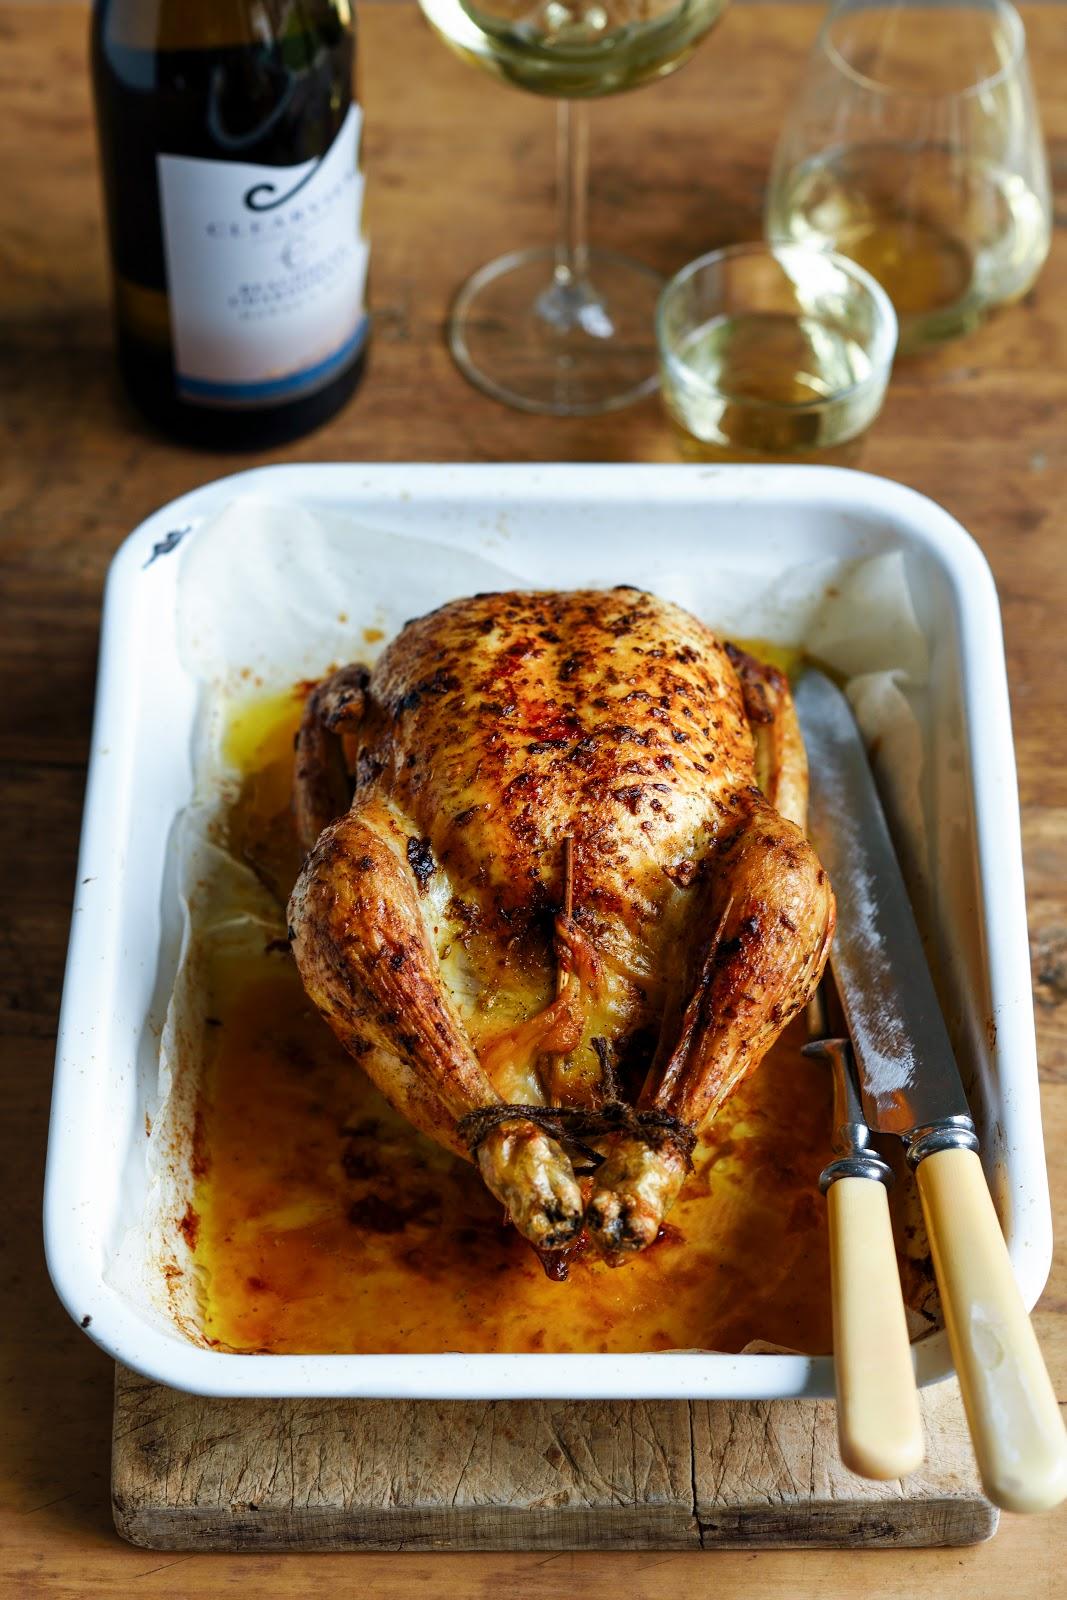 28 the kitchn roast chicken recipe amelia saltsman s roast the kitchn roast chicken from the kitchen new world wine awards roast chicken